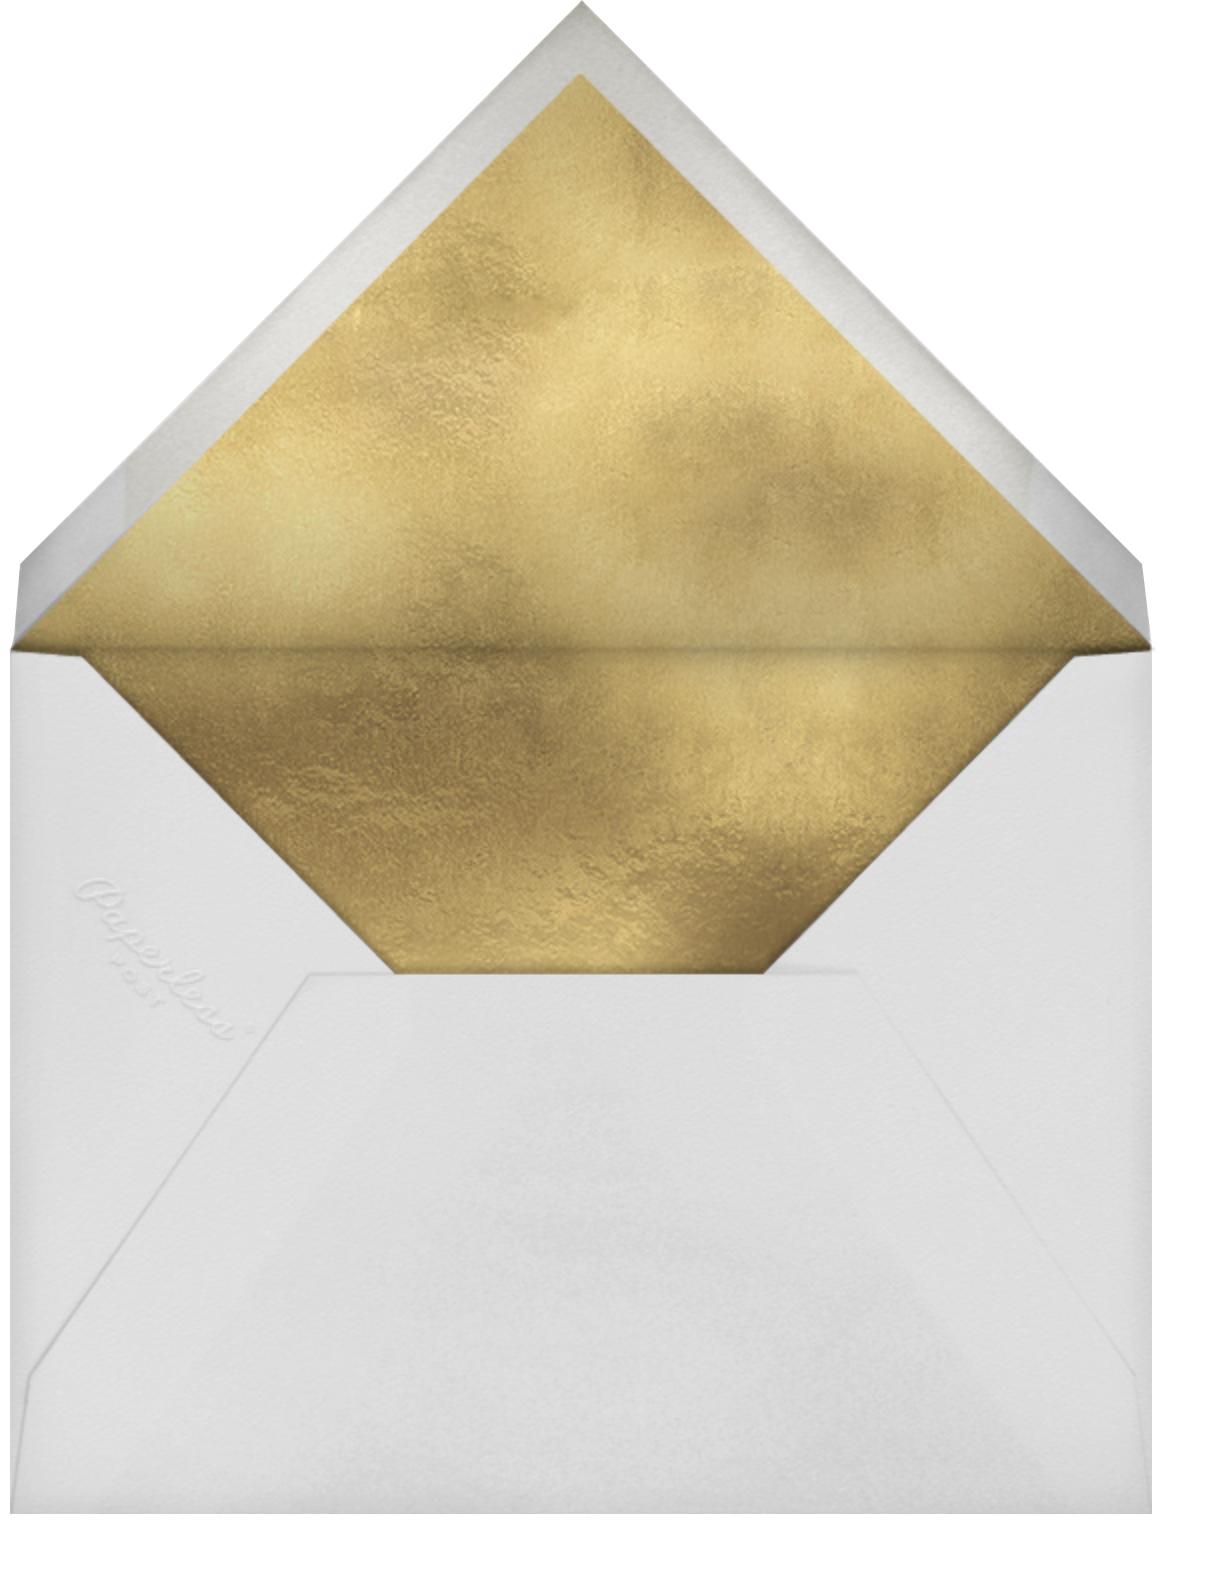 Fauve Border - kate spade new york - Envelope